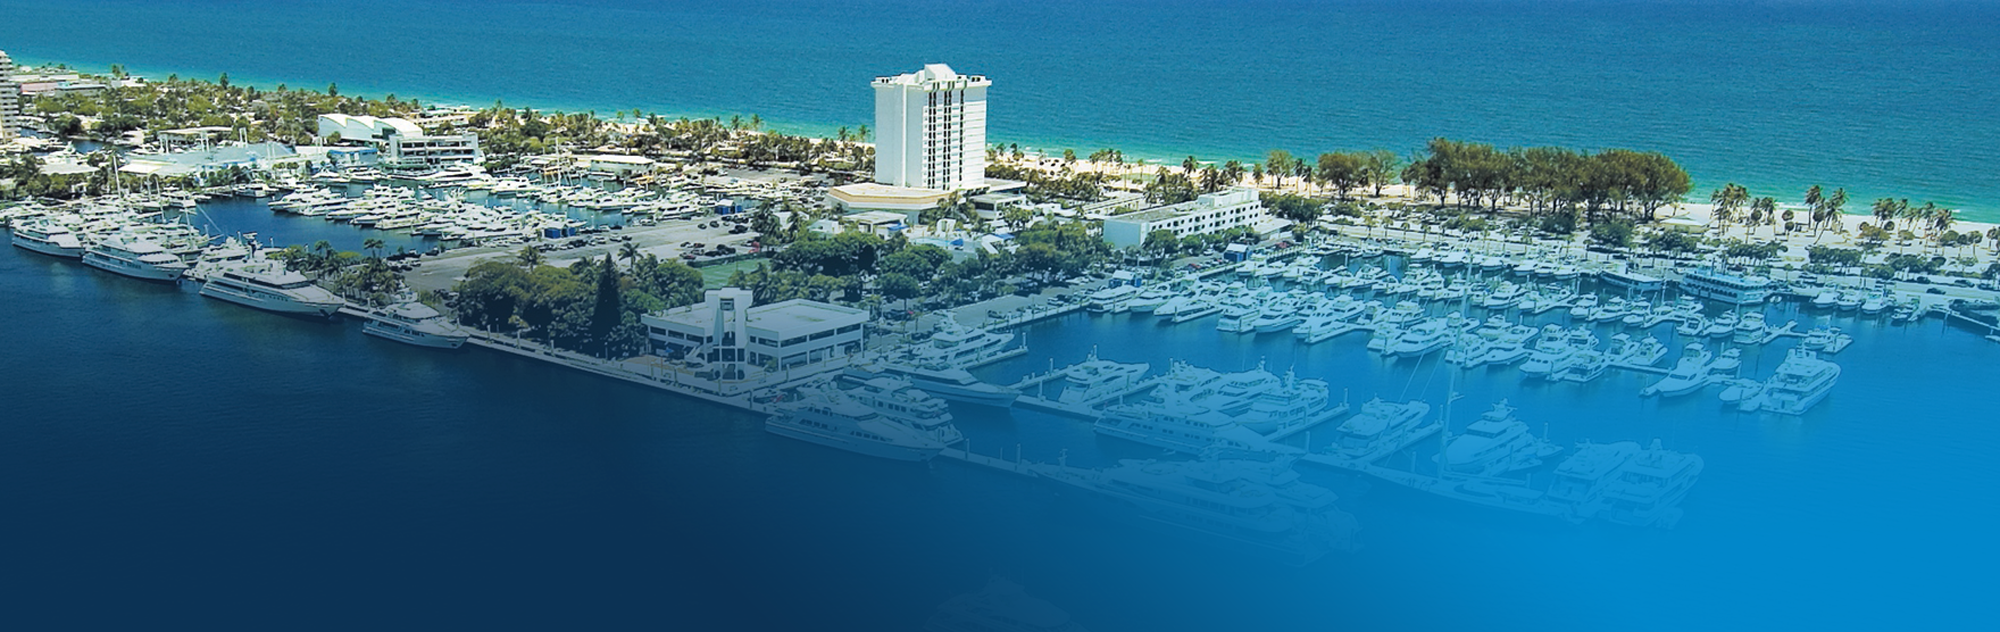 Fort Lauderdale, FL - February 7-9, 2020